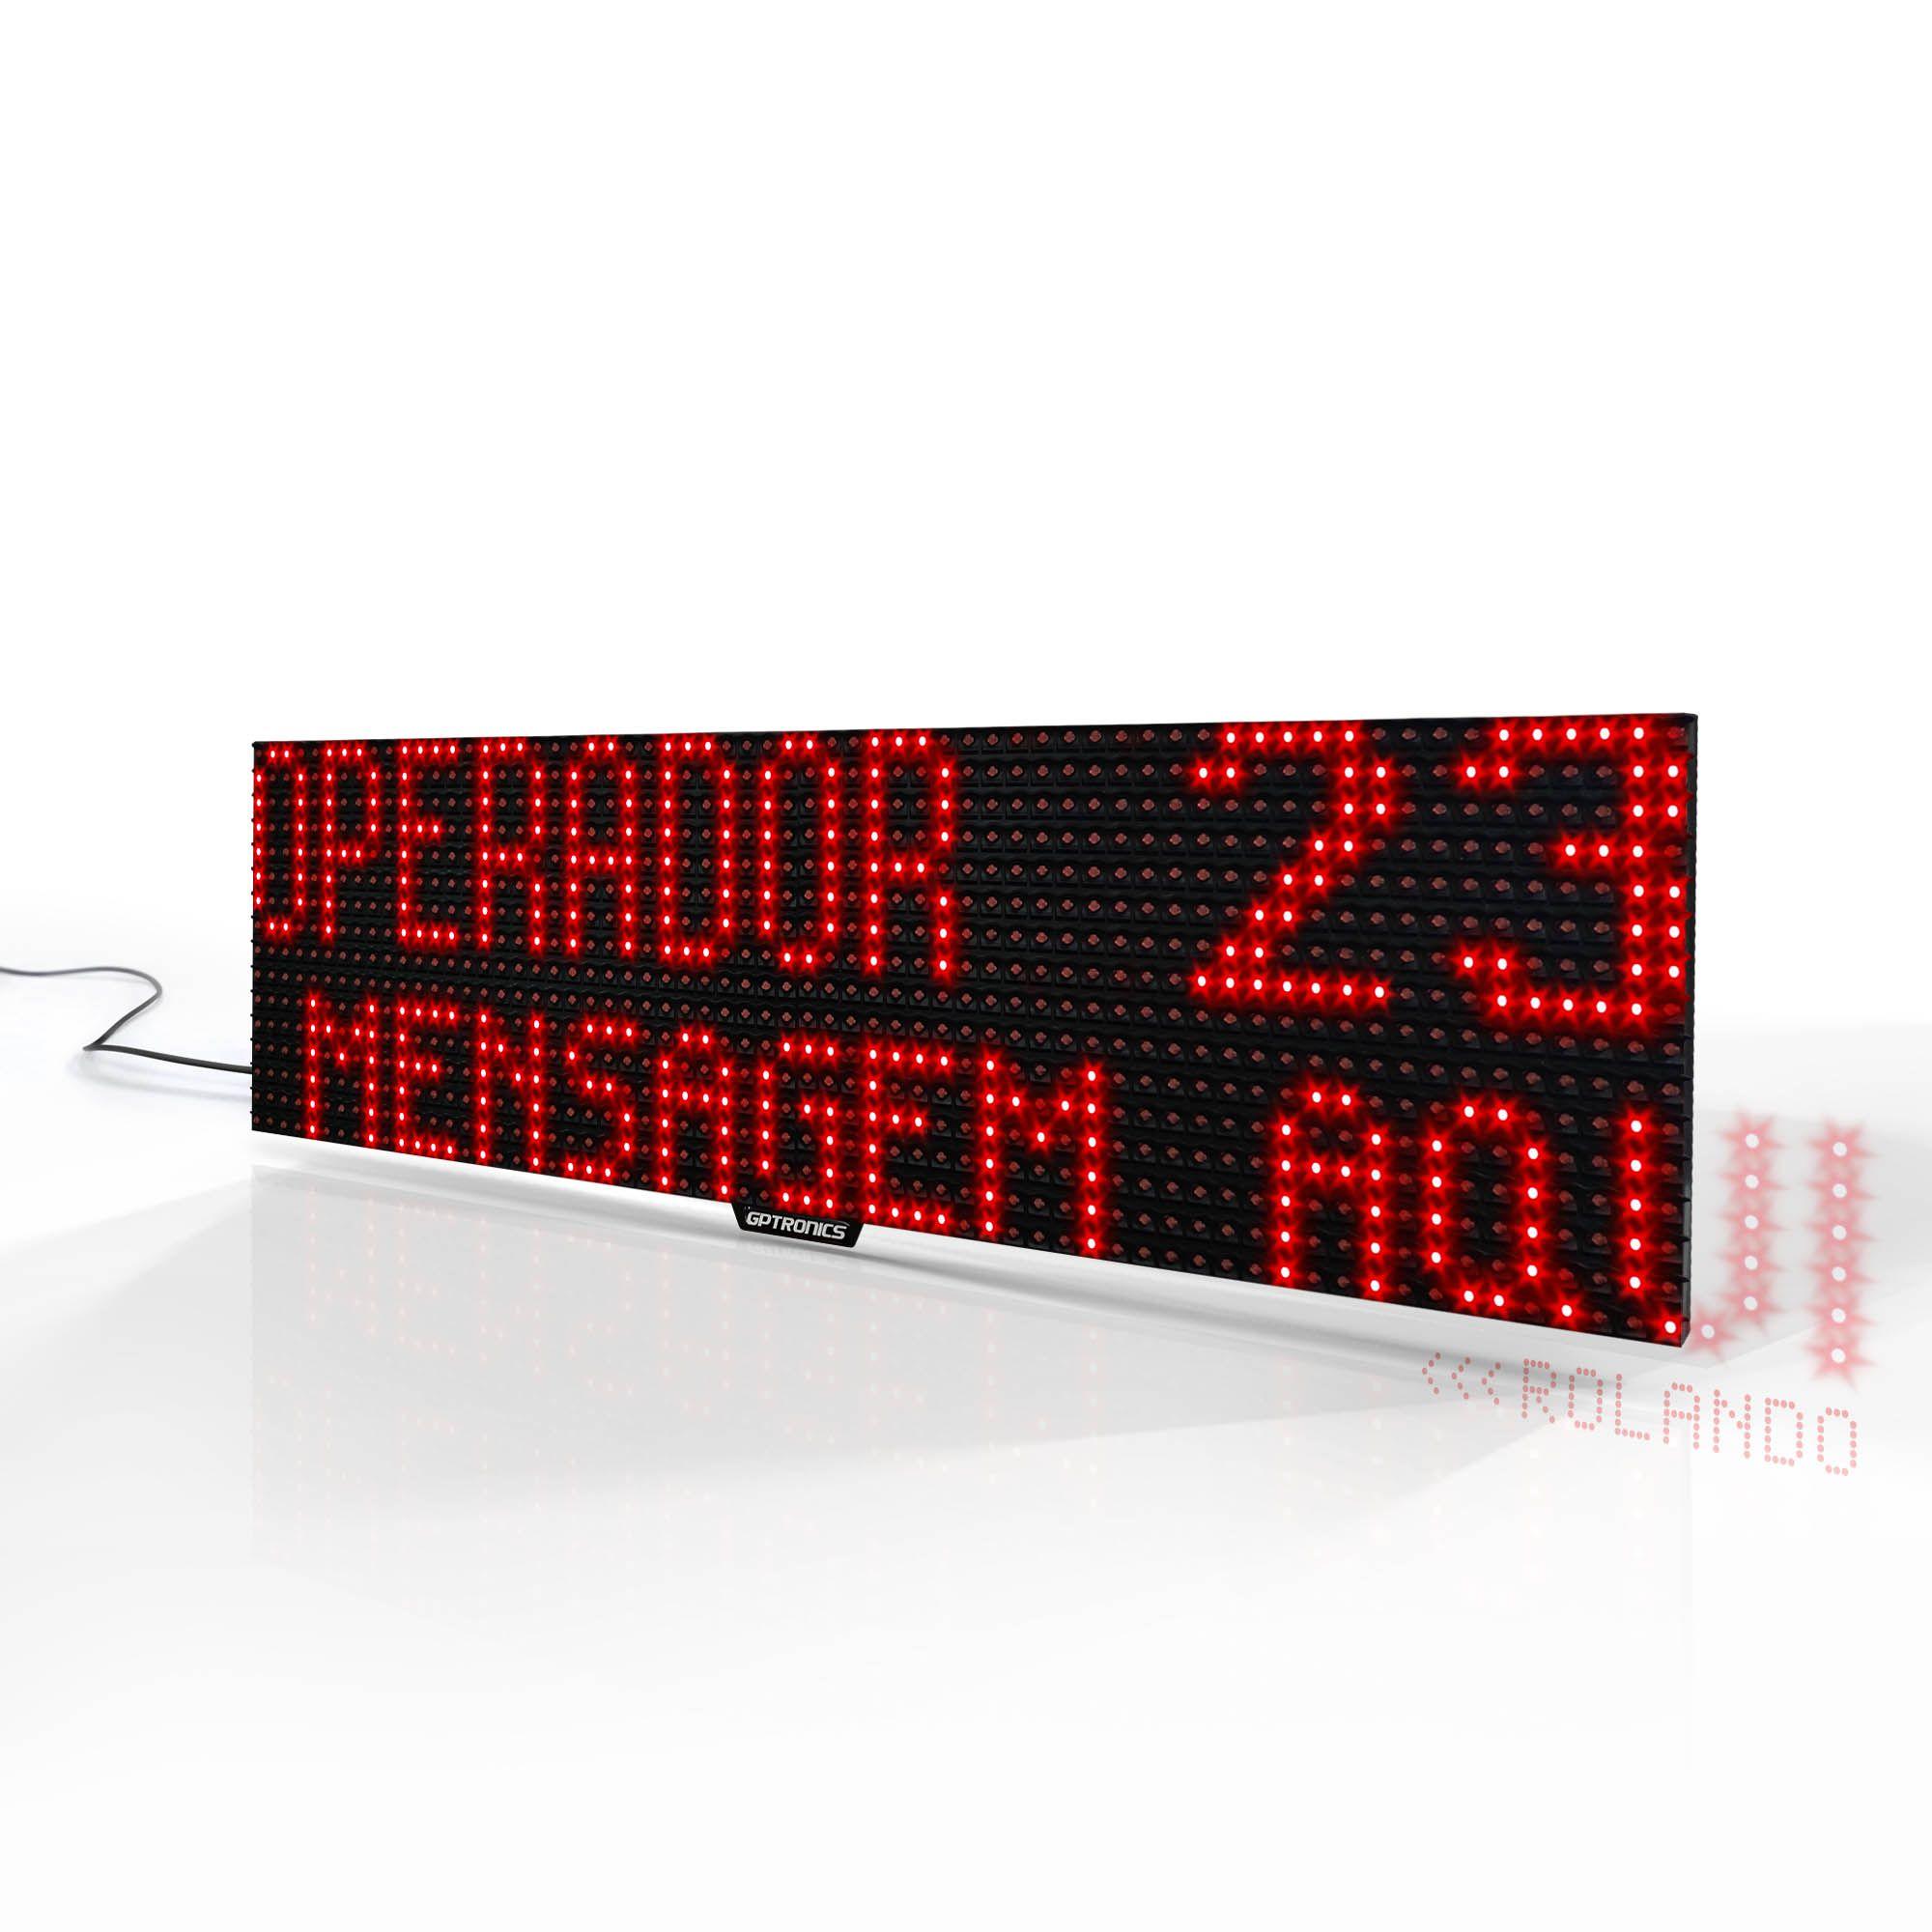 Agilize Full GT - Painel de Guichê com Texto e Mensagem - 64x16x4cm